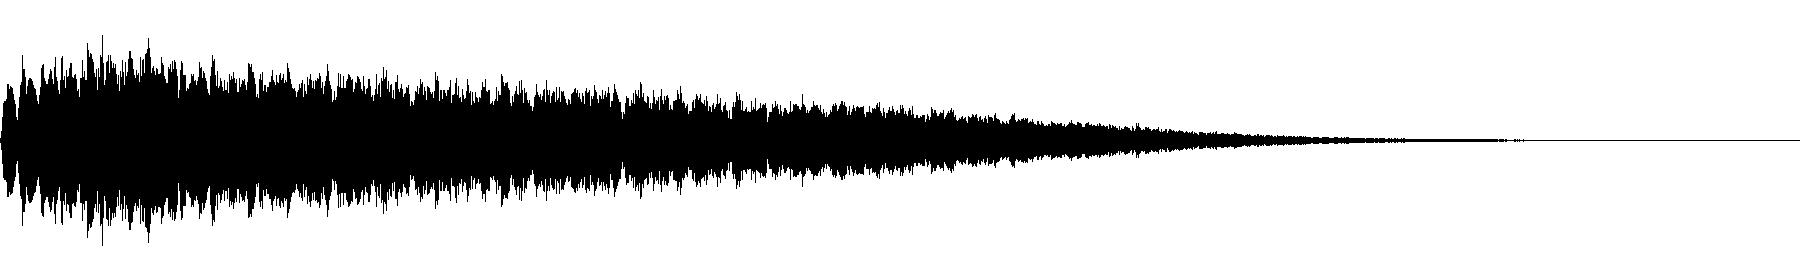 chrome sparks chord flute arpeggio amaj